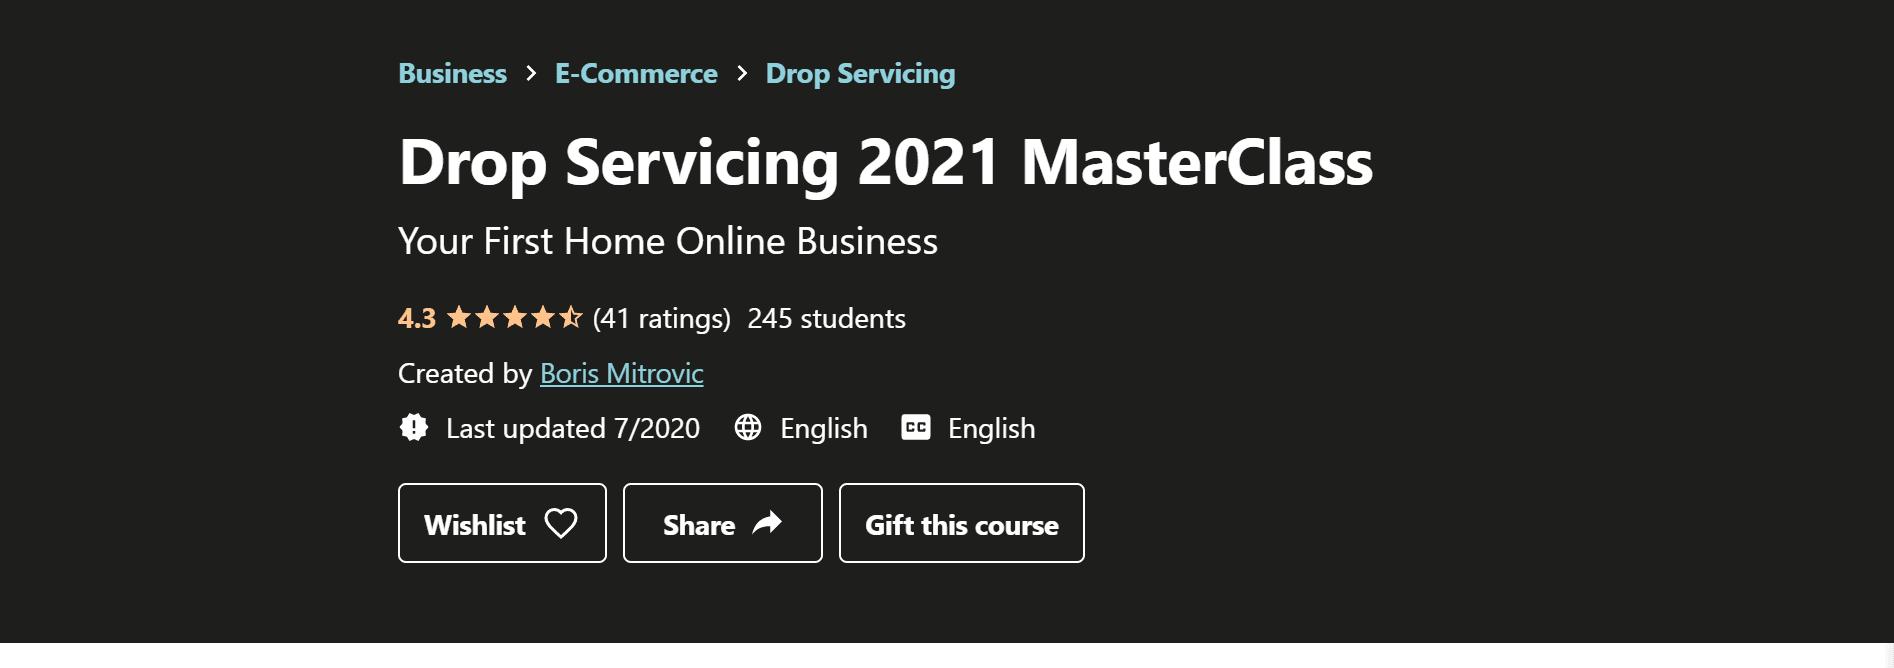 Drop servicing masterclass- best courses for drop service